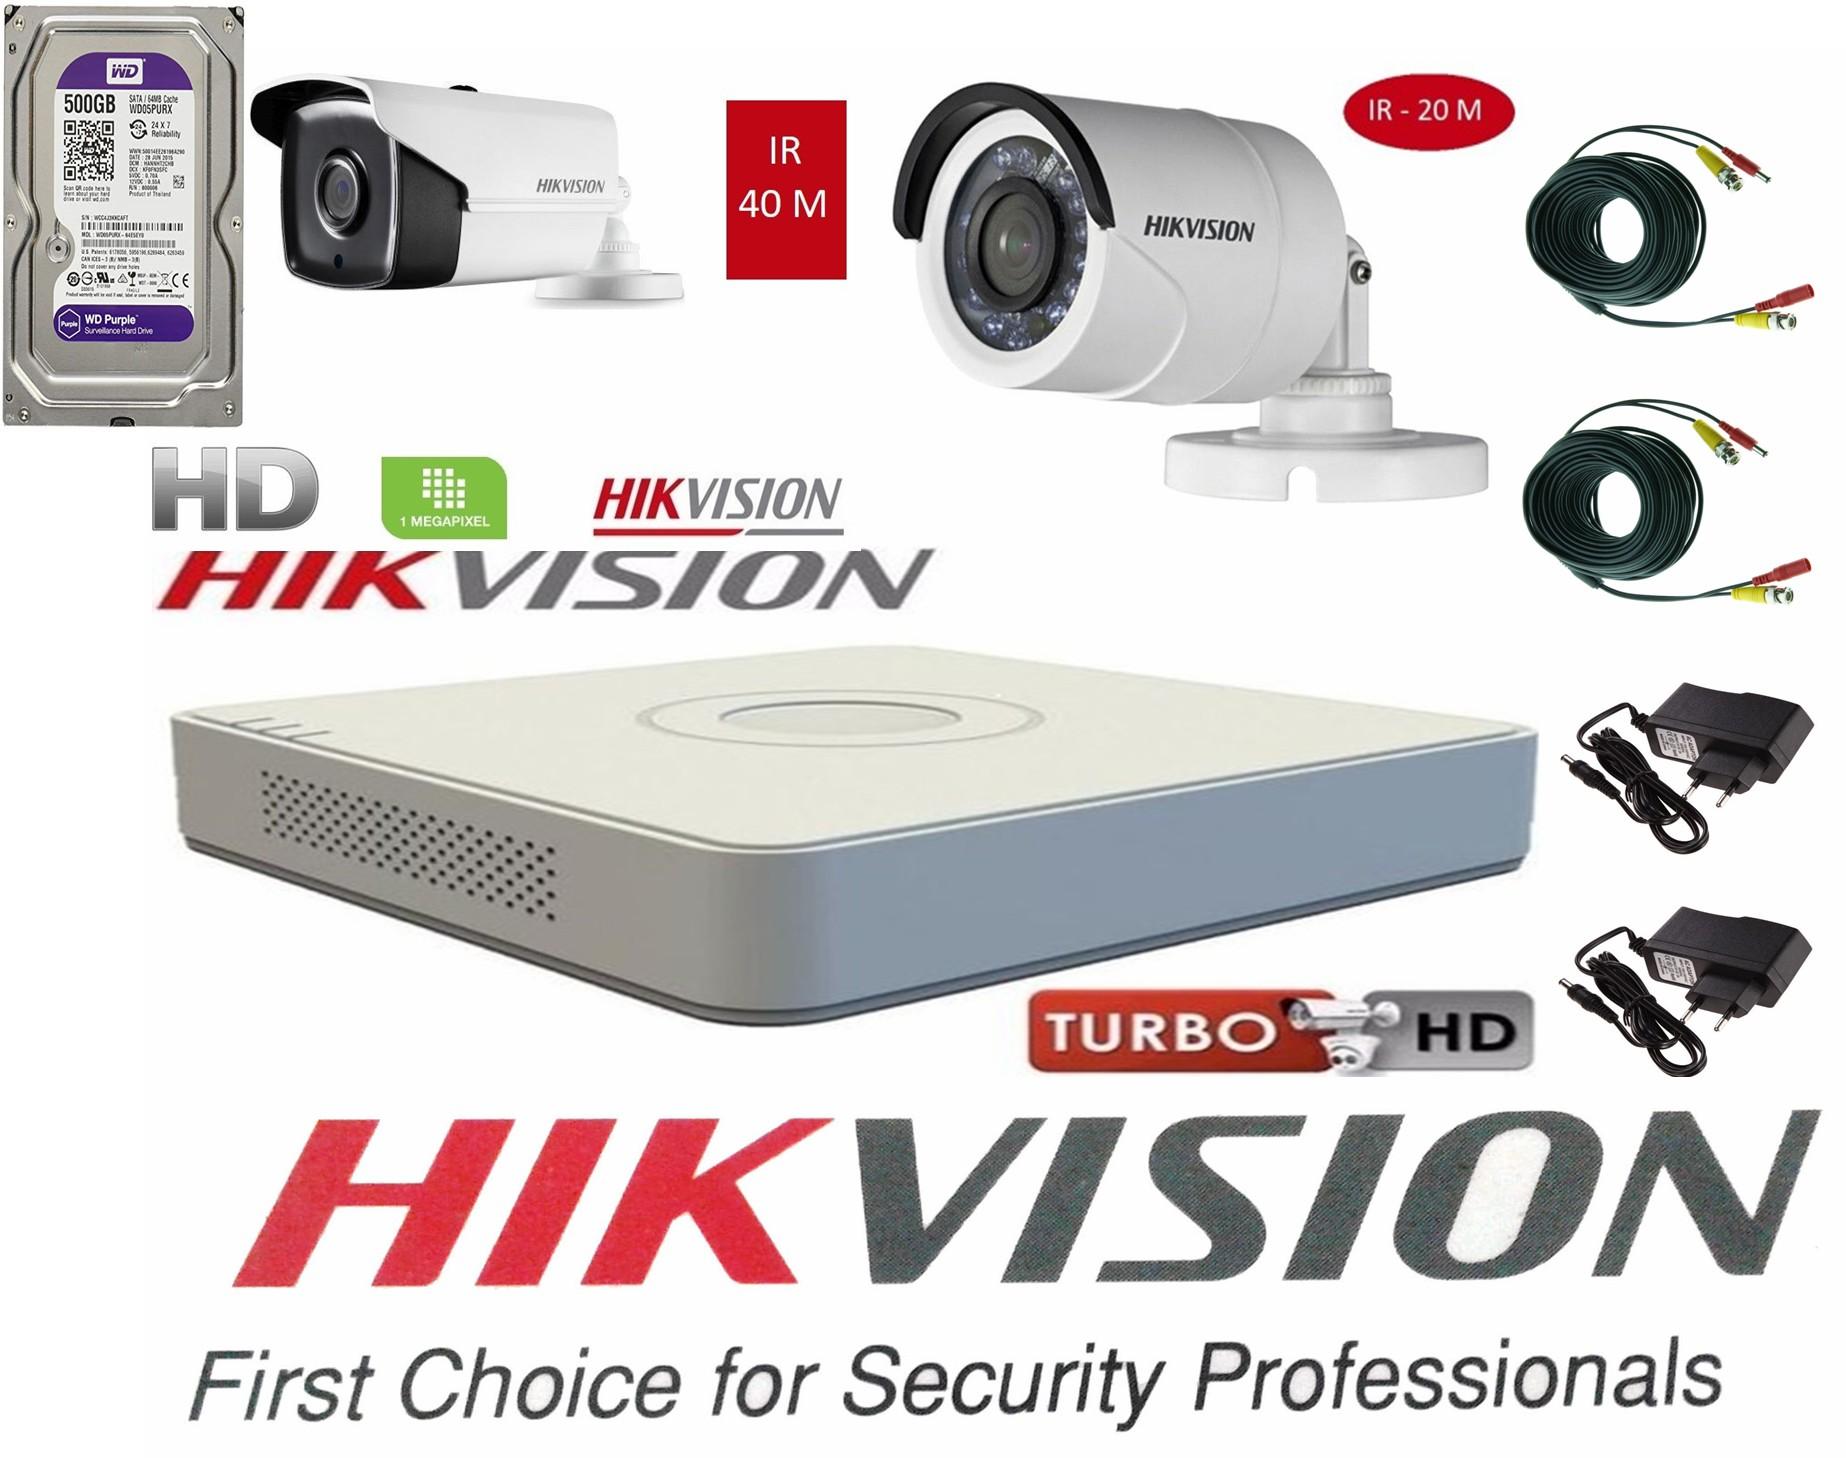 Sistem supraveghere video Hikvision 2 camere Turbo HD IR 40 M si IR 20 M cu DVR Hikvision , HARD 500GB, full accesorii